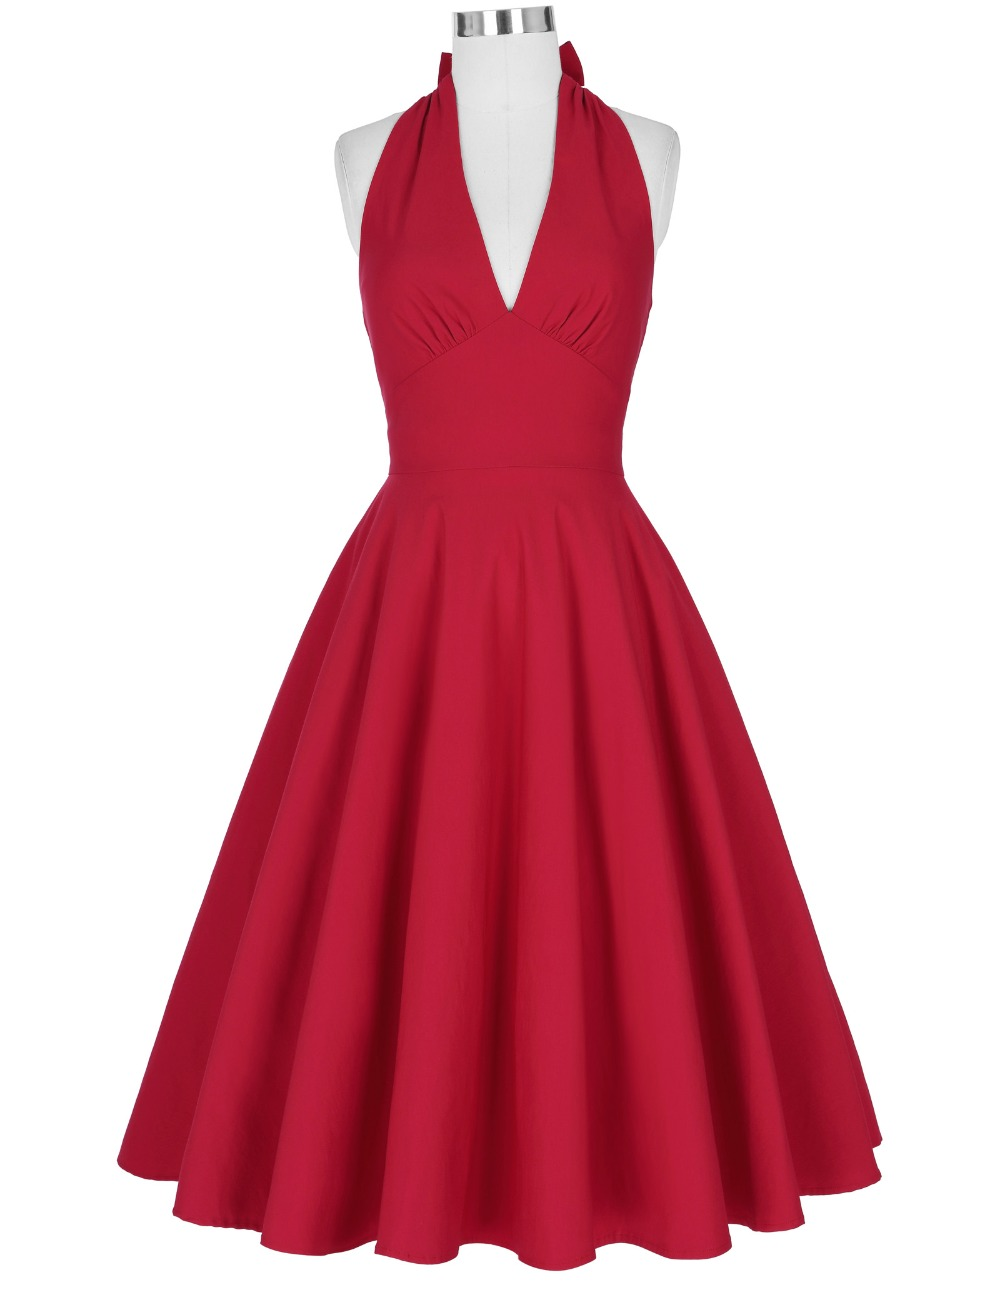 Marilyn monroe style wedding dress